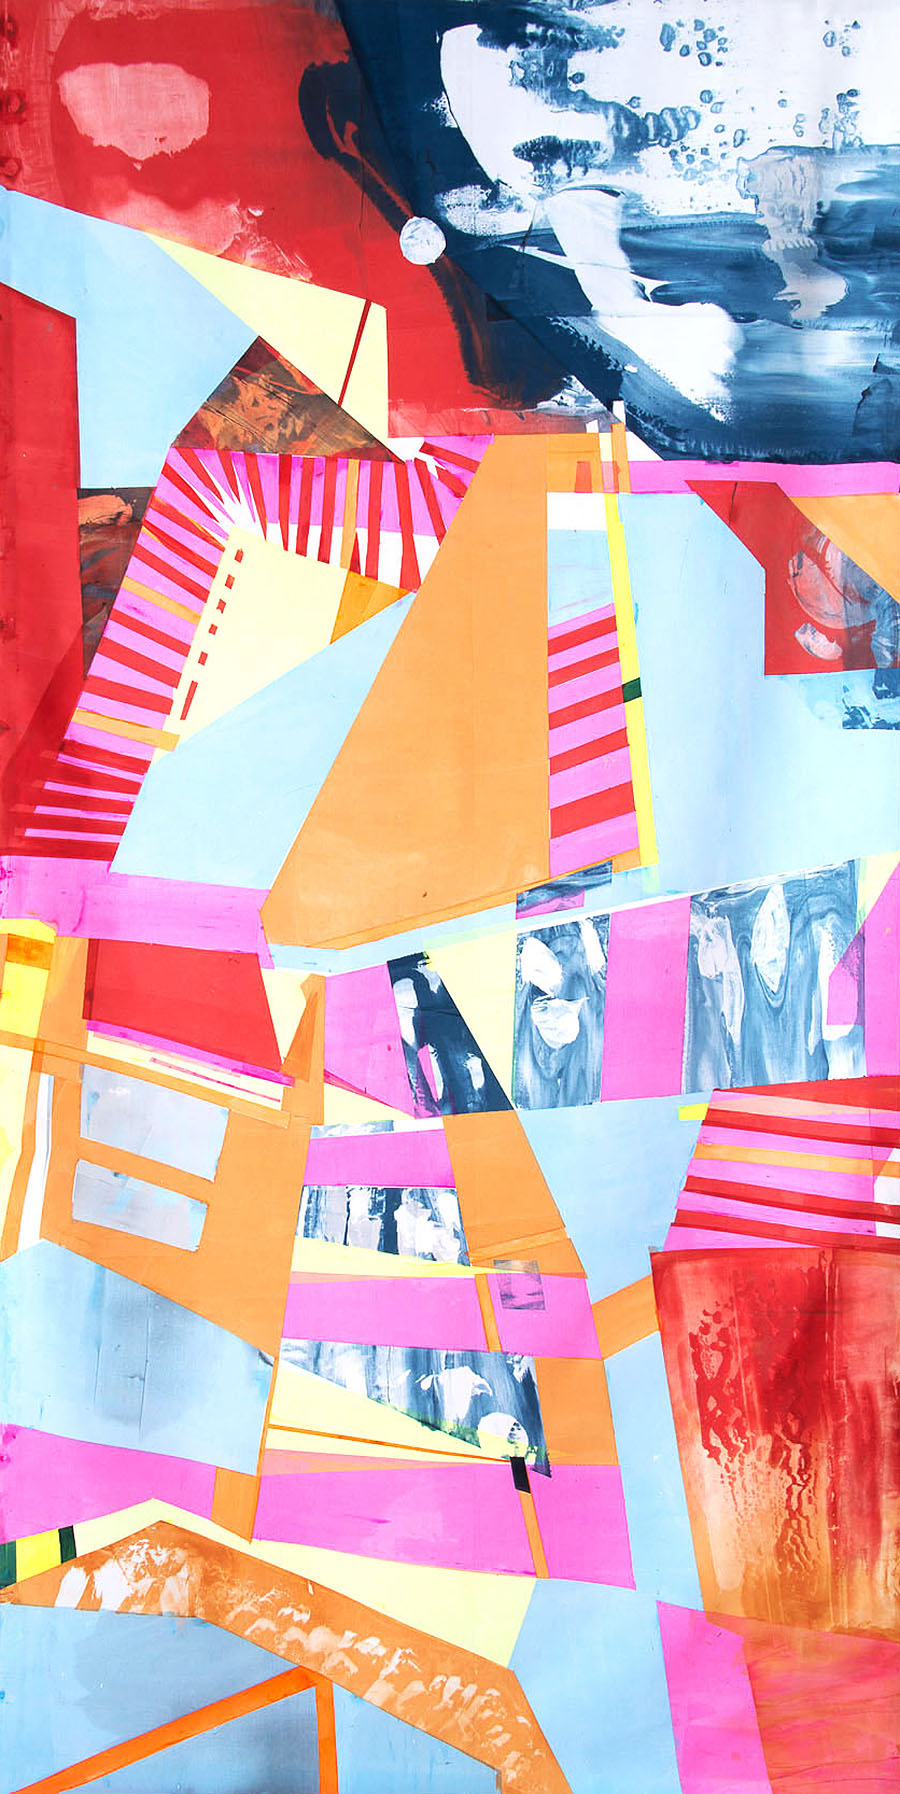 Sarah_Haenn_abstraction_graphic_expression_Jed_Williams_Gallery_Tony_Ward_Studio